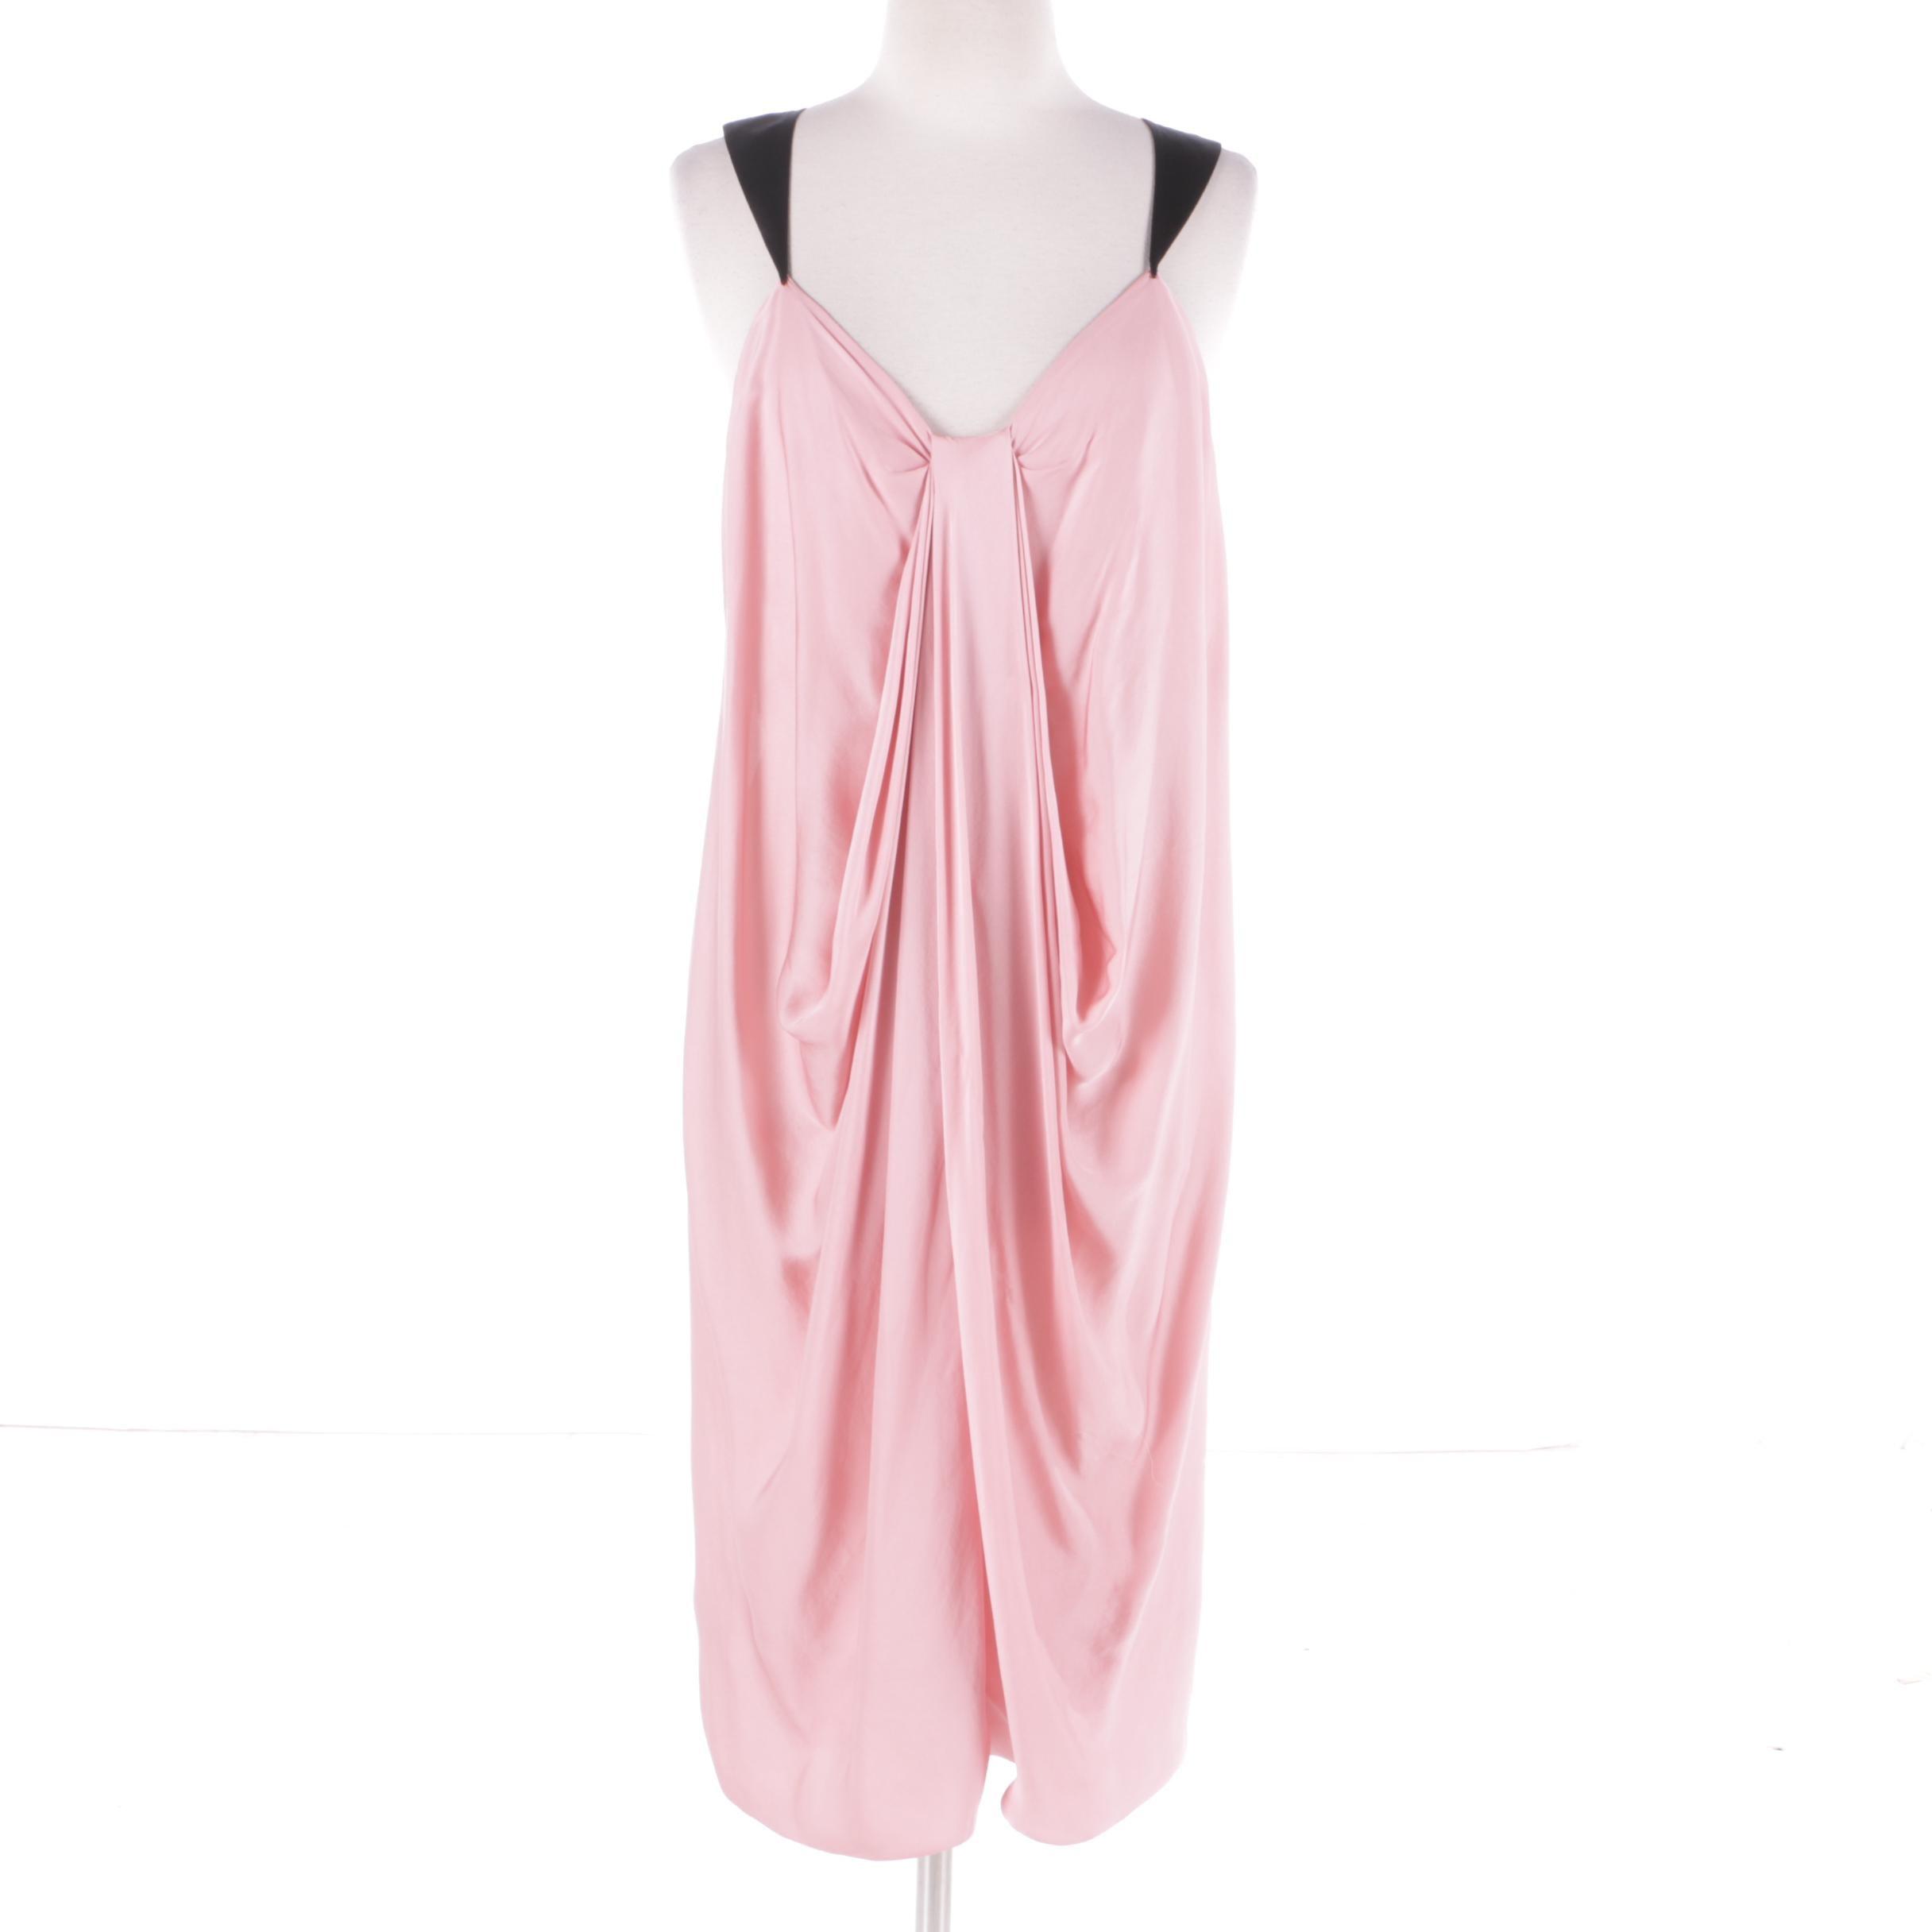 Donna Karan Collection Pink and Black Silk Draped Sleeveless Dress